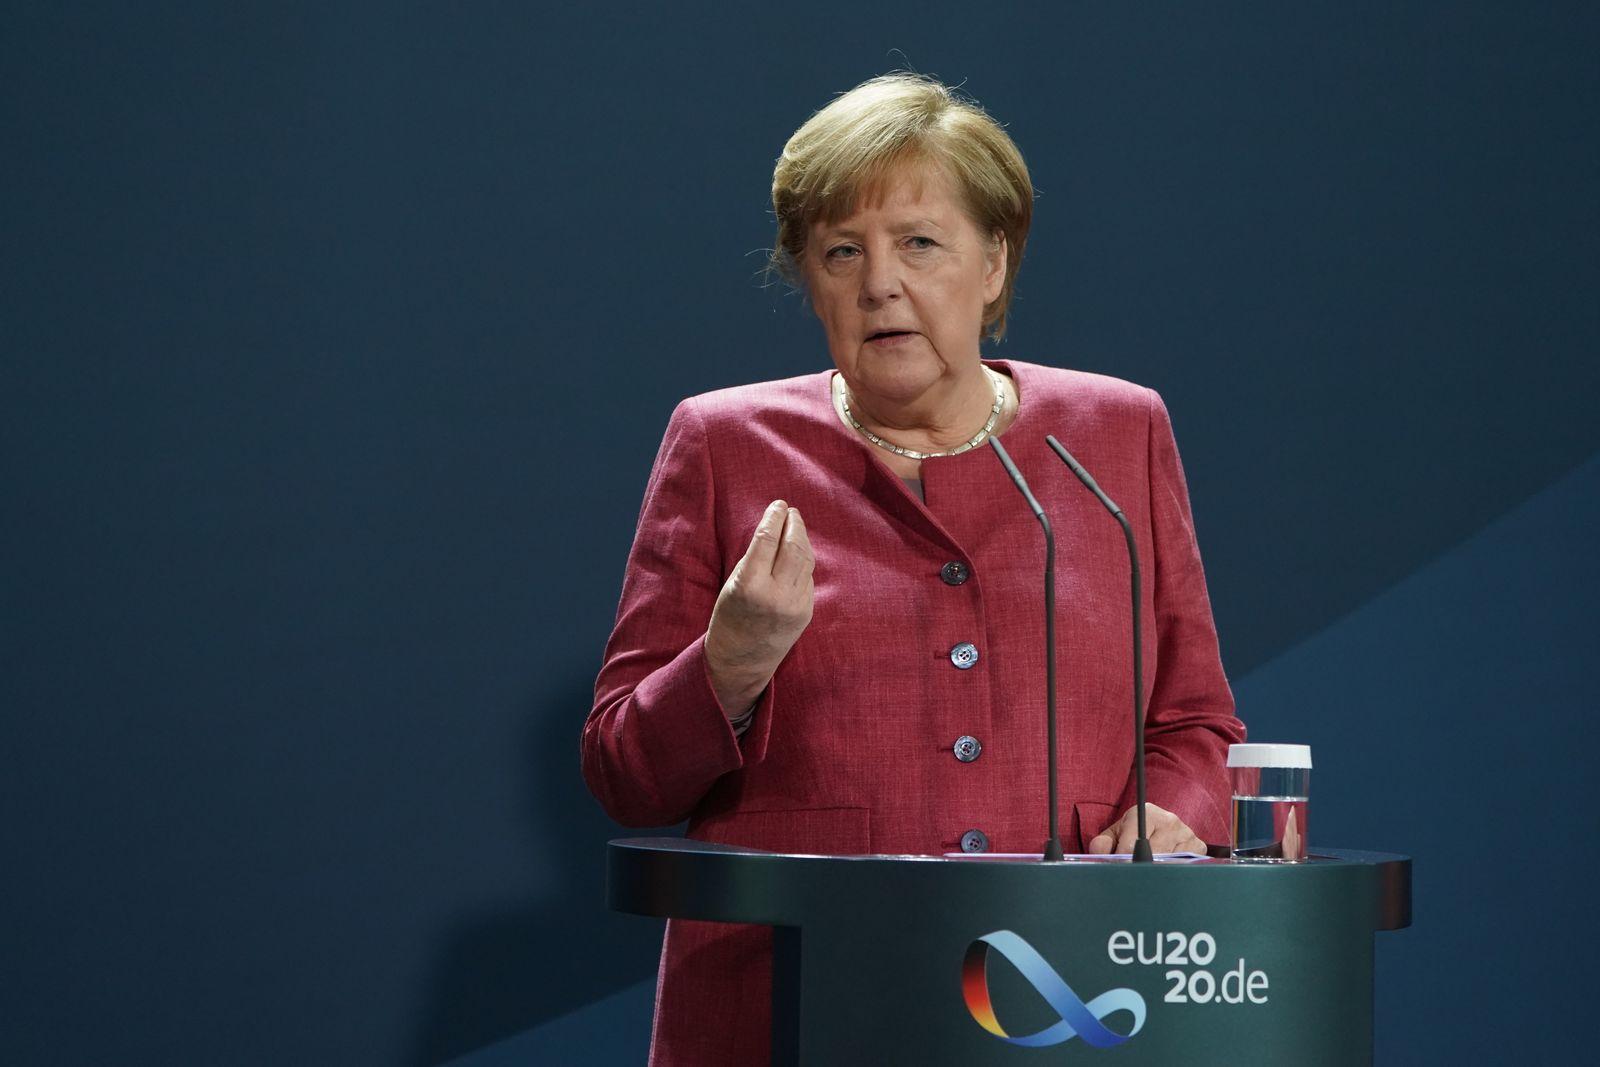 German Chancellor Angela Merkel Gives A Statement On Rising Coronavirus Cases In German Cities